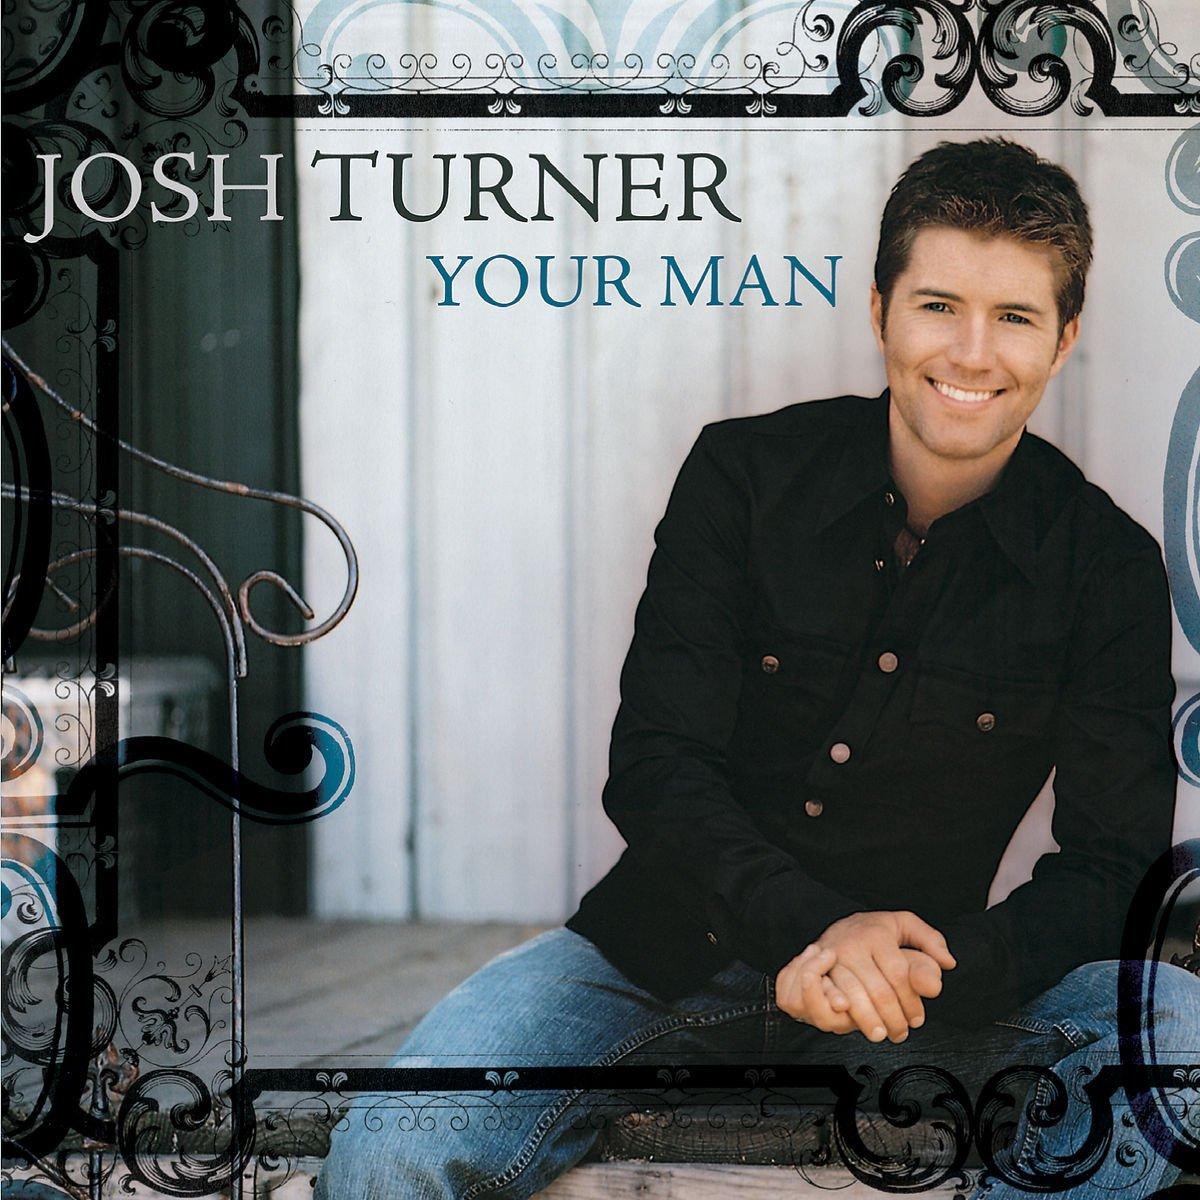 Your Man by Mca Nashville